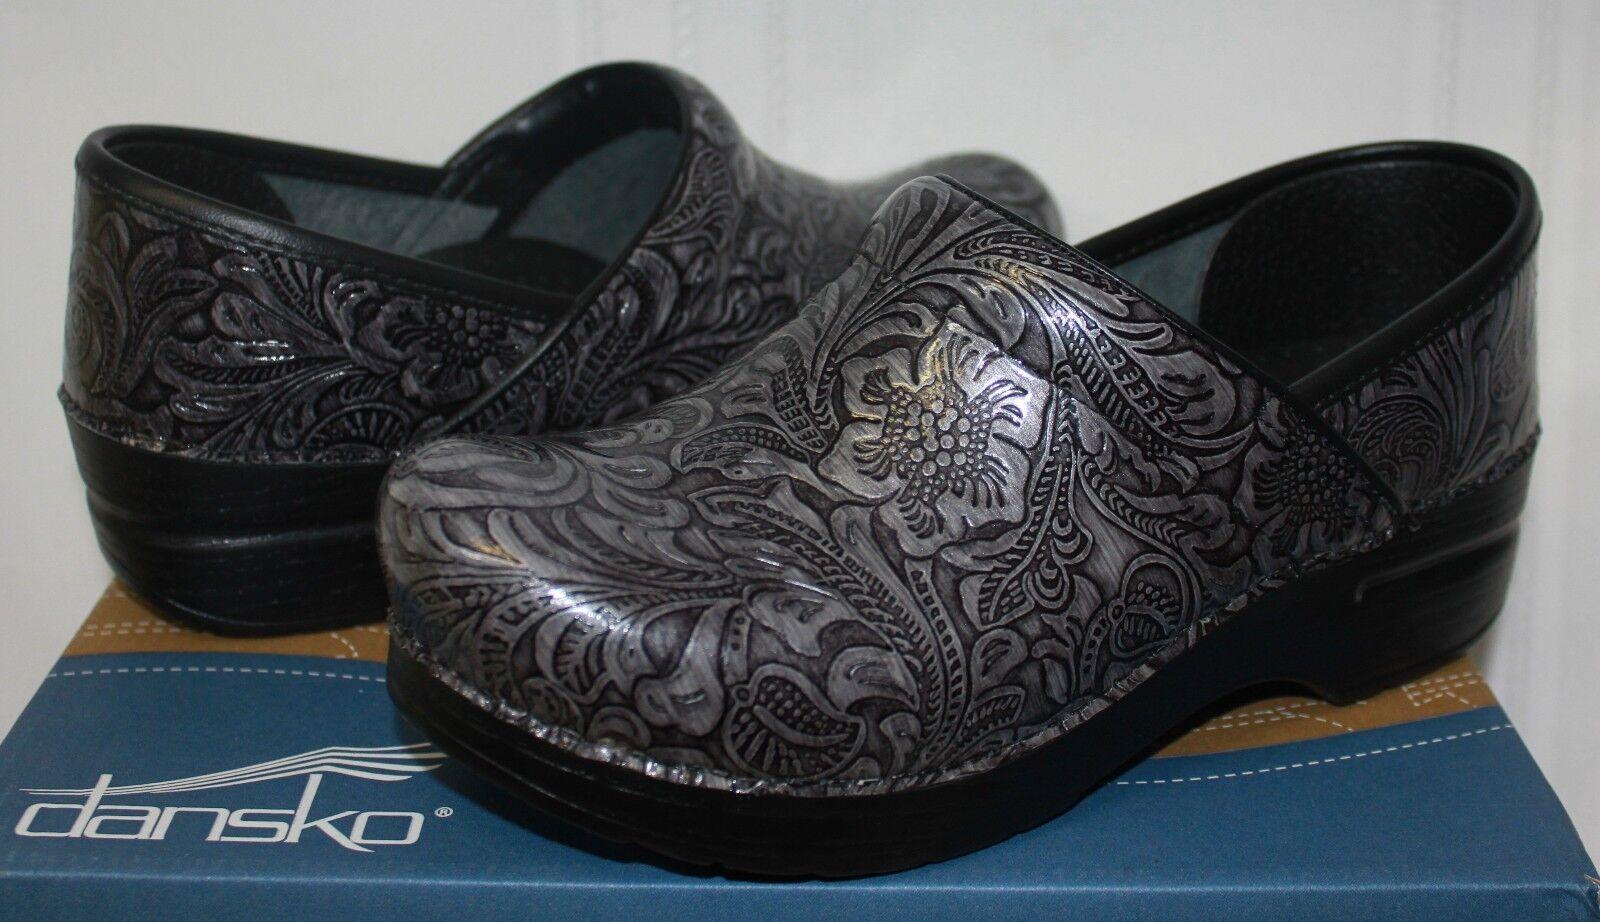 Dansko Women's Professional Grey Tooled Tooled Tooled Leather Clogs NEW 9da62d